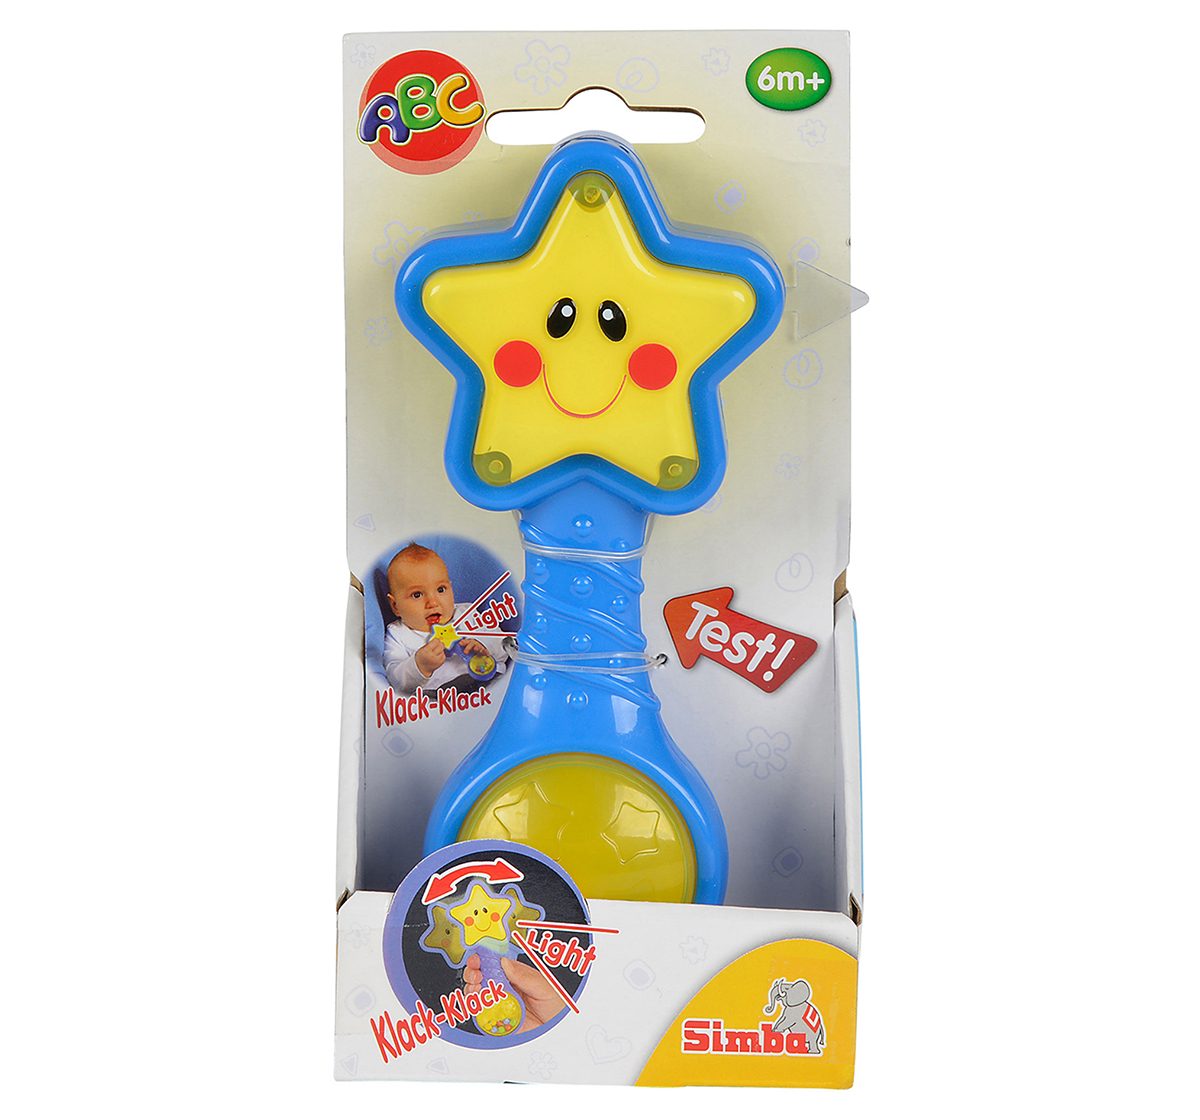 Simba | Simba Abc Star Rattle With Light, Unisex, 0M+ (Blue)